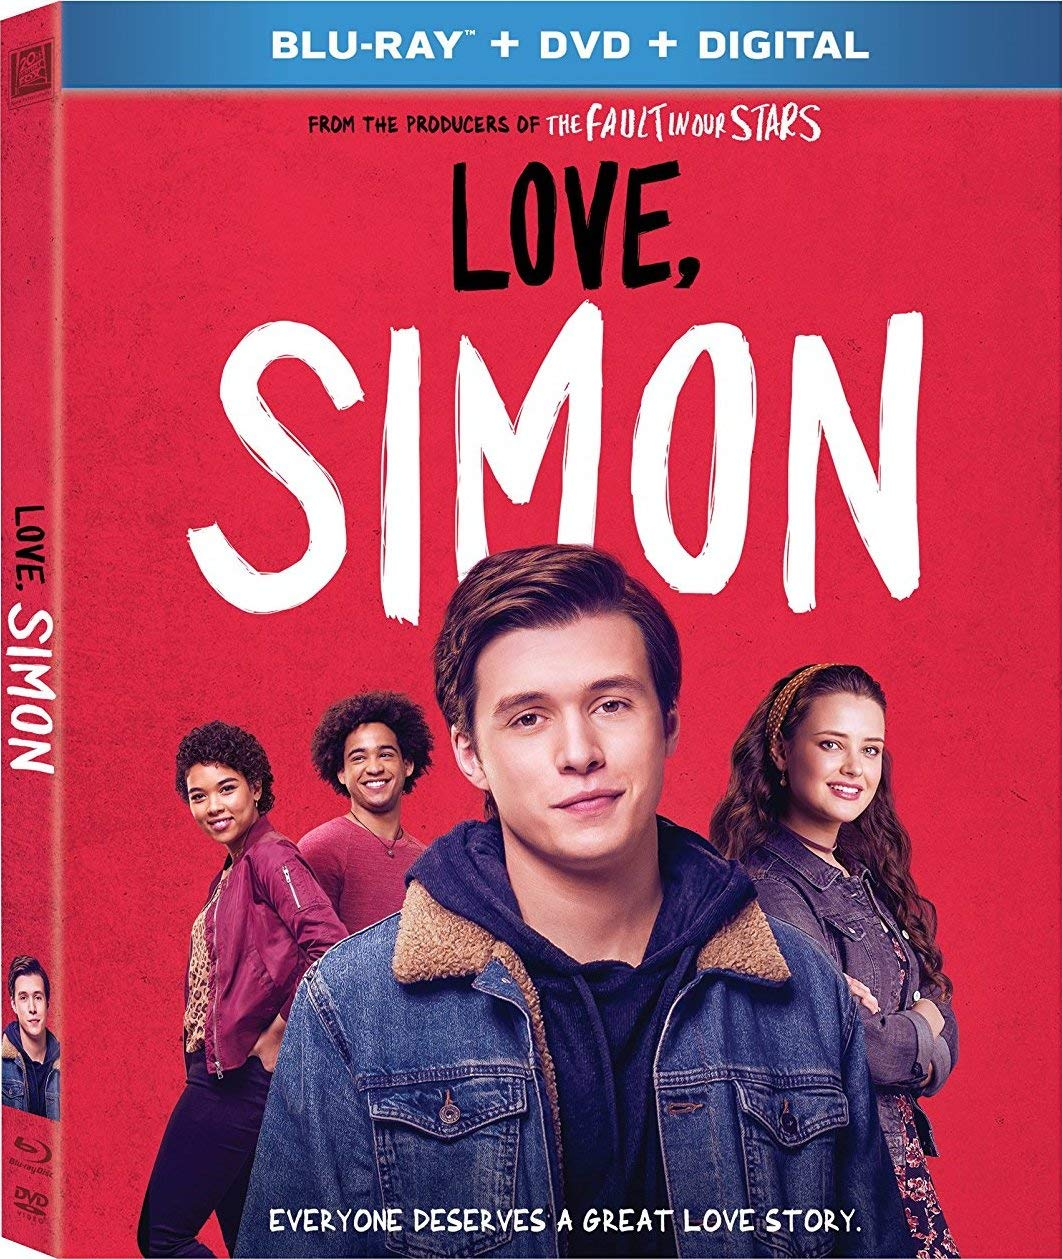 Free Download Love Simon (2018) Hollywood Movie ORG Dual Audio [Hindi or English] 720p BluRay 650MB Download On Mp4moviez Fliz Movies